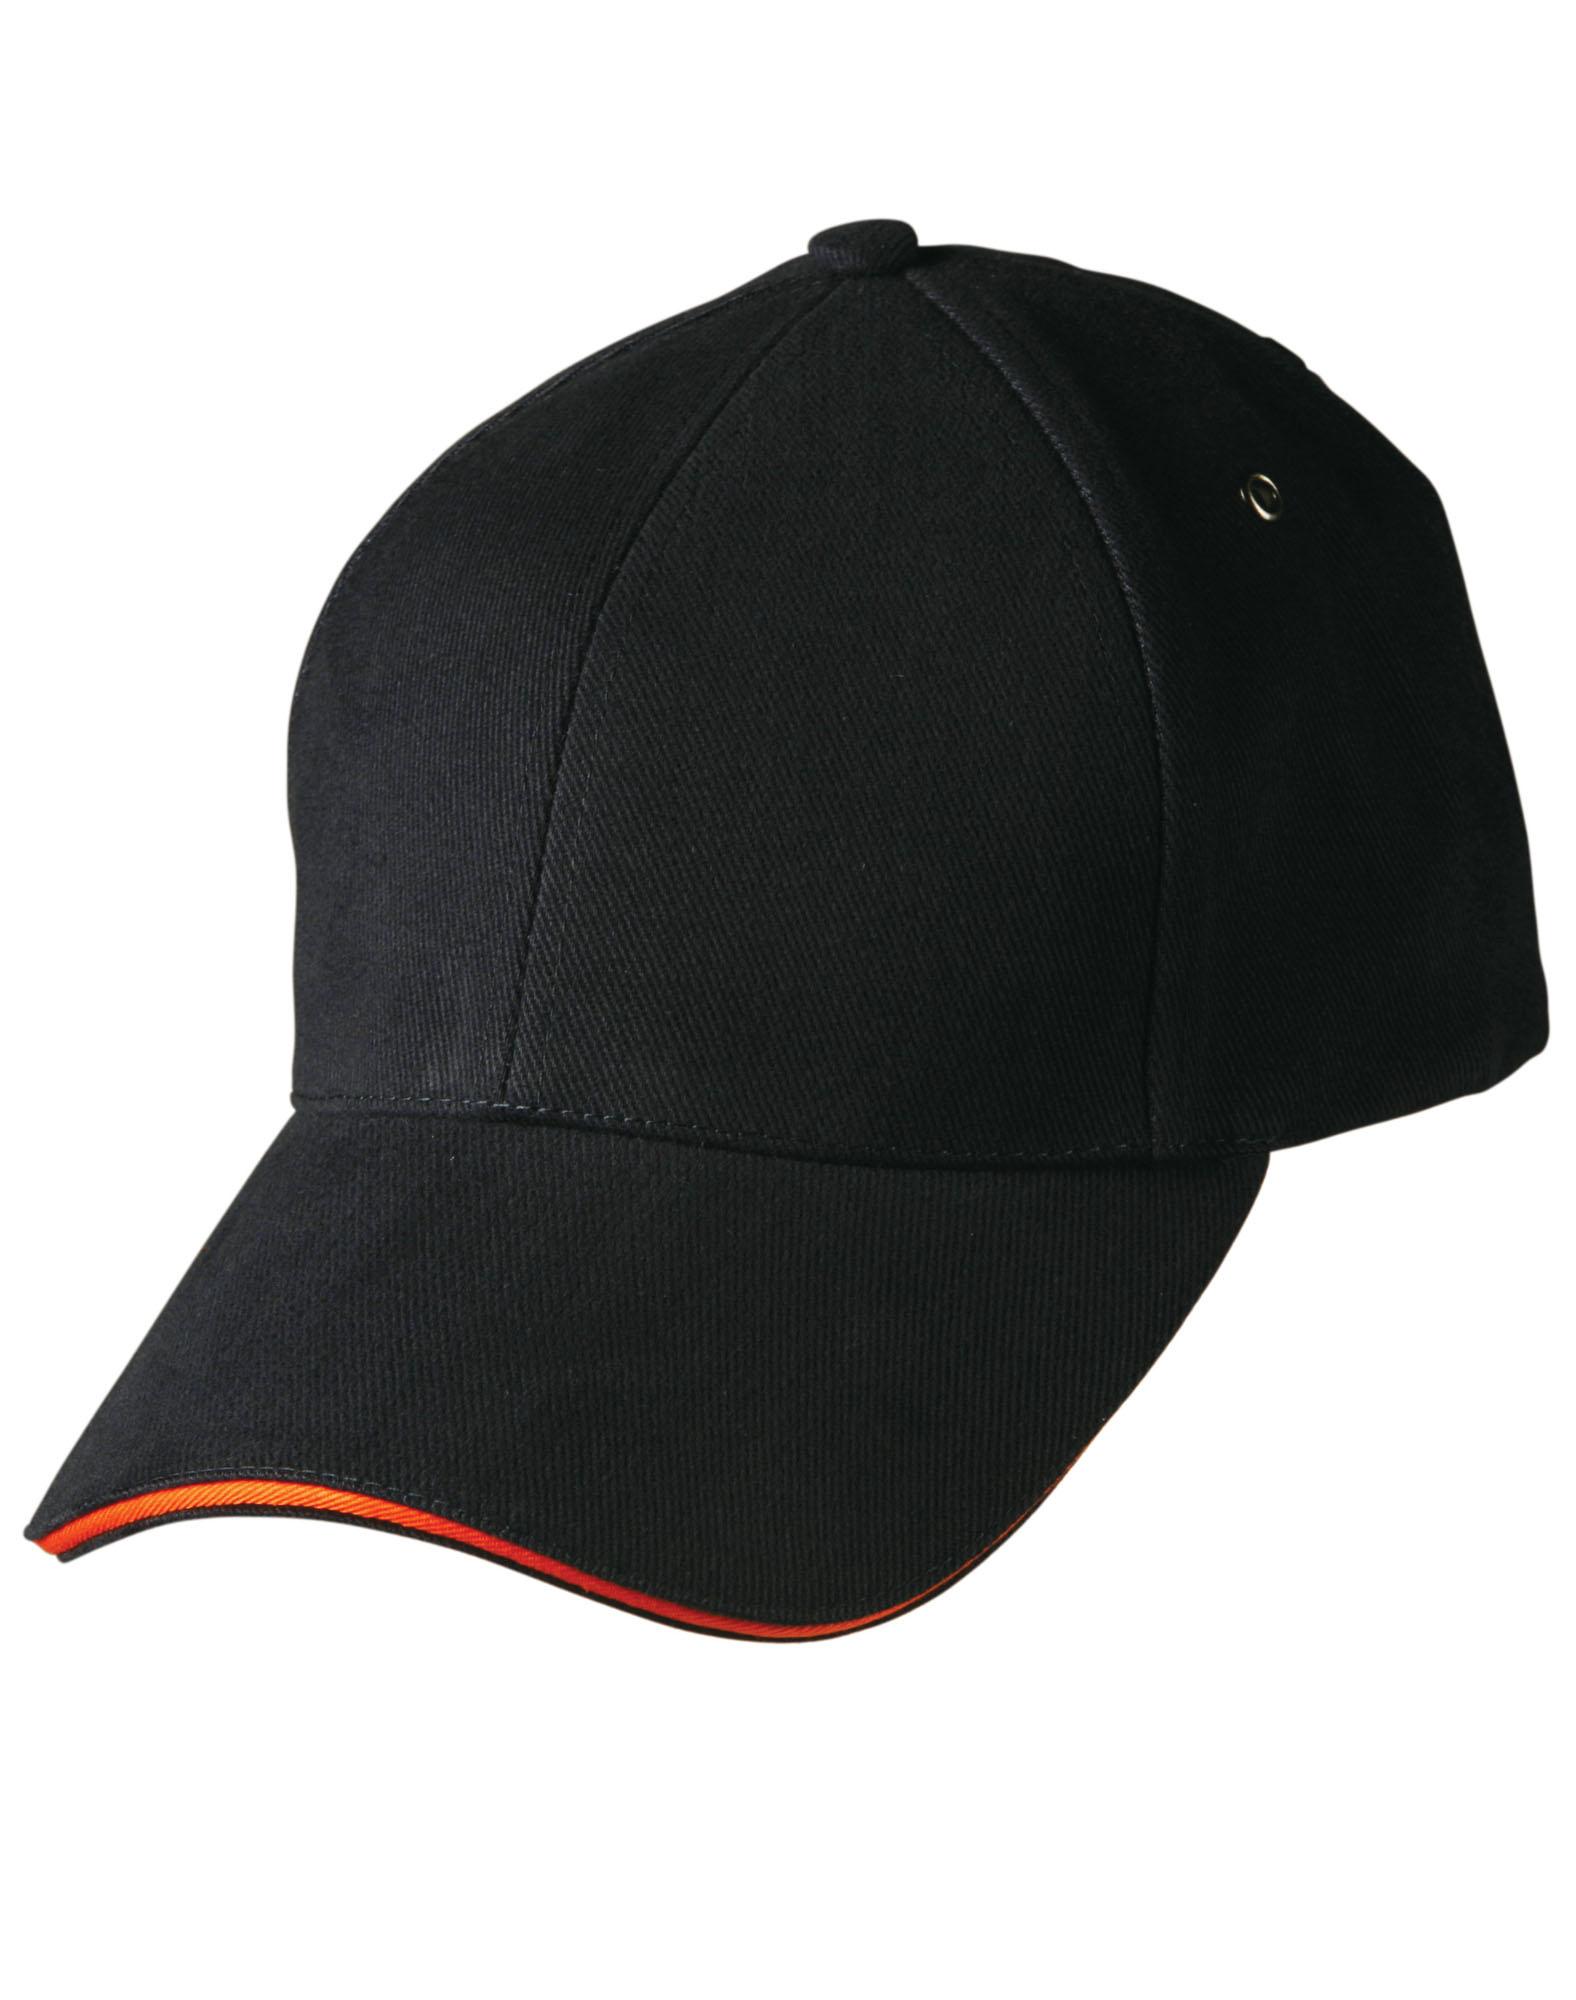 Navy.Orange